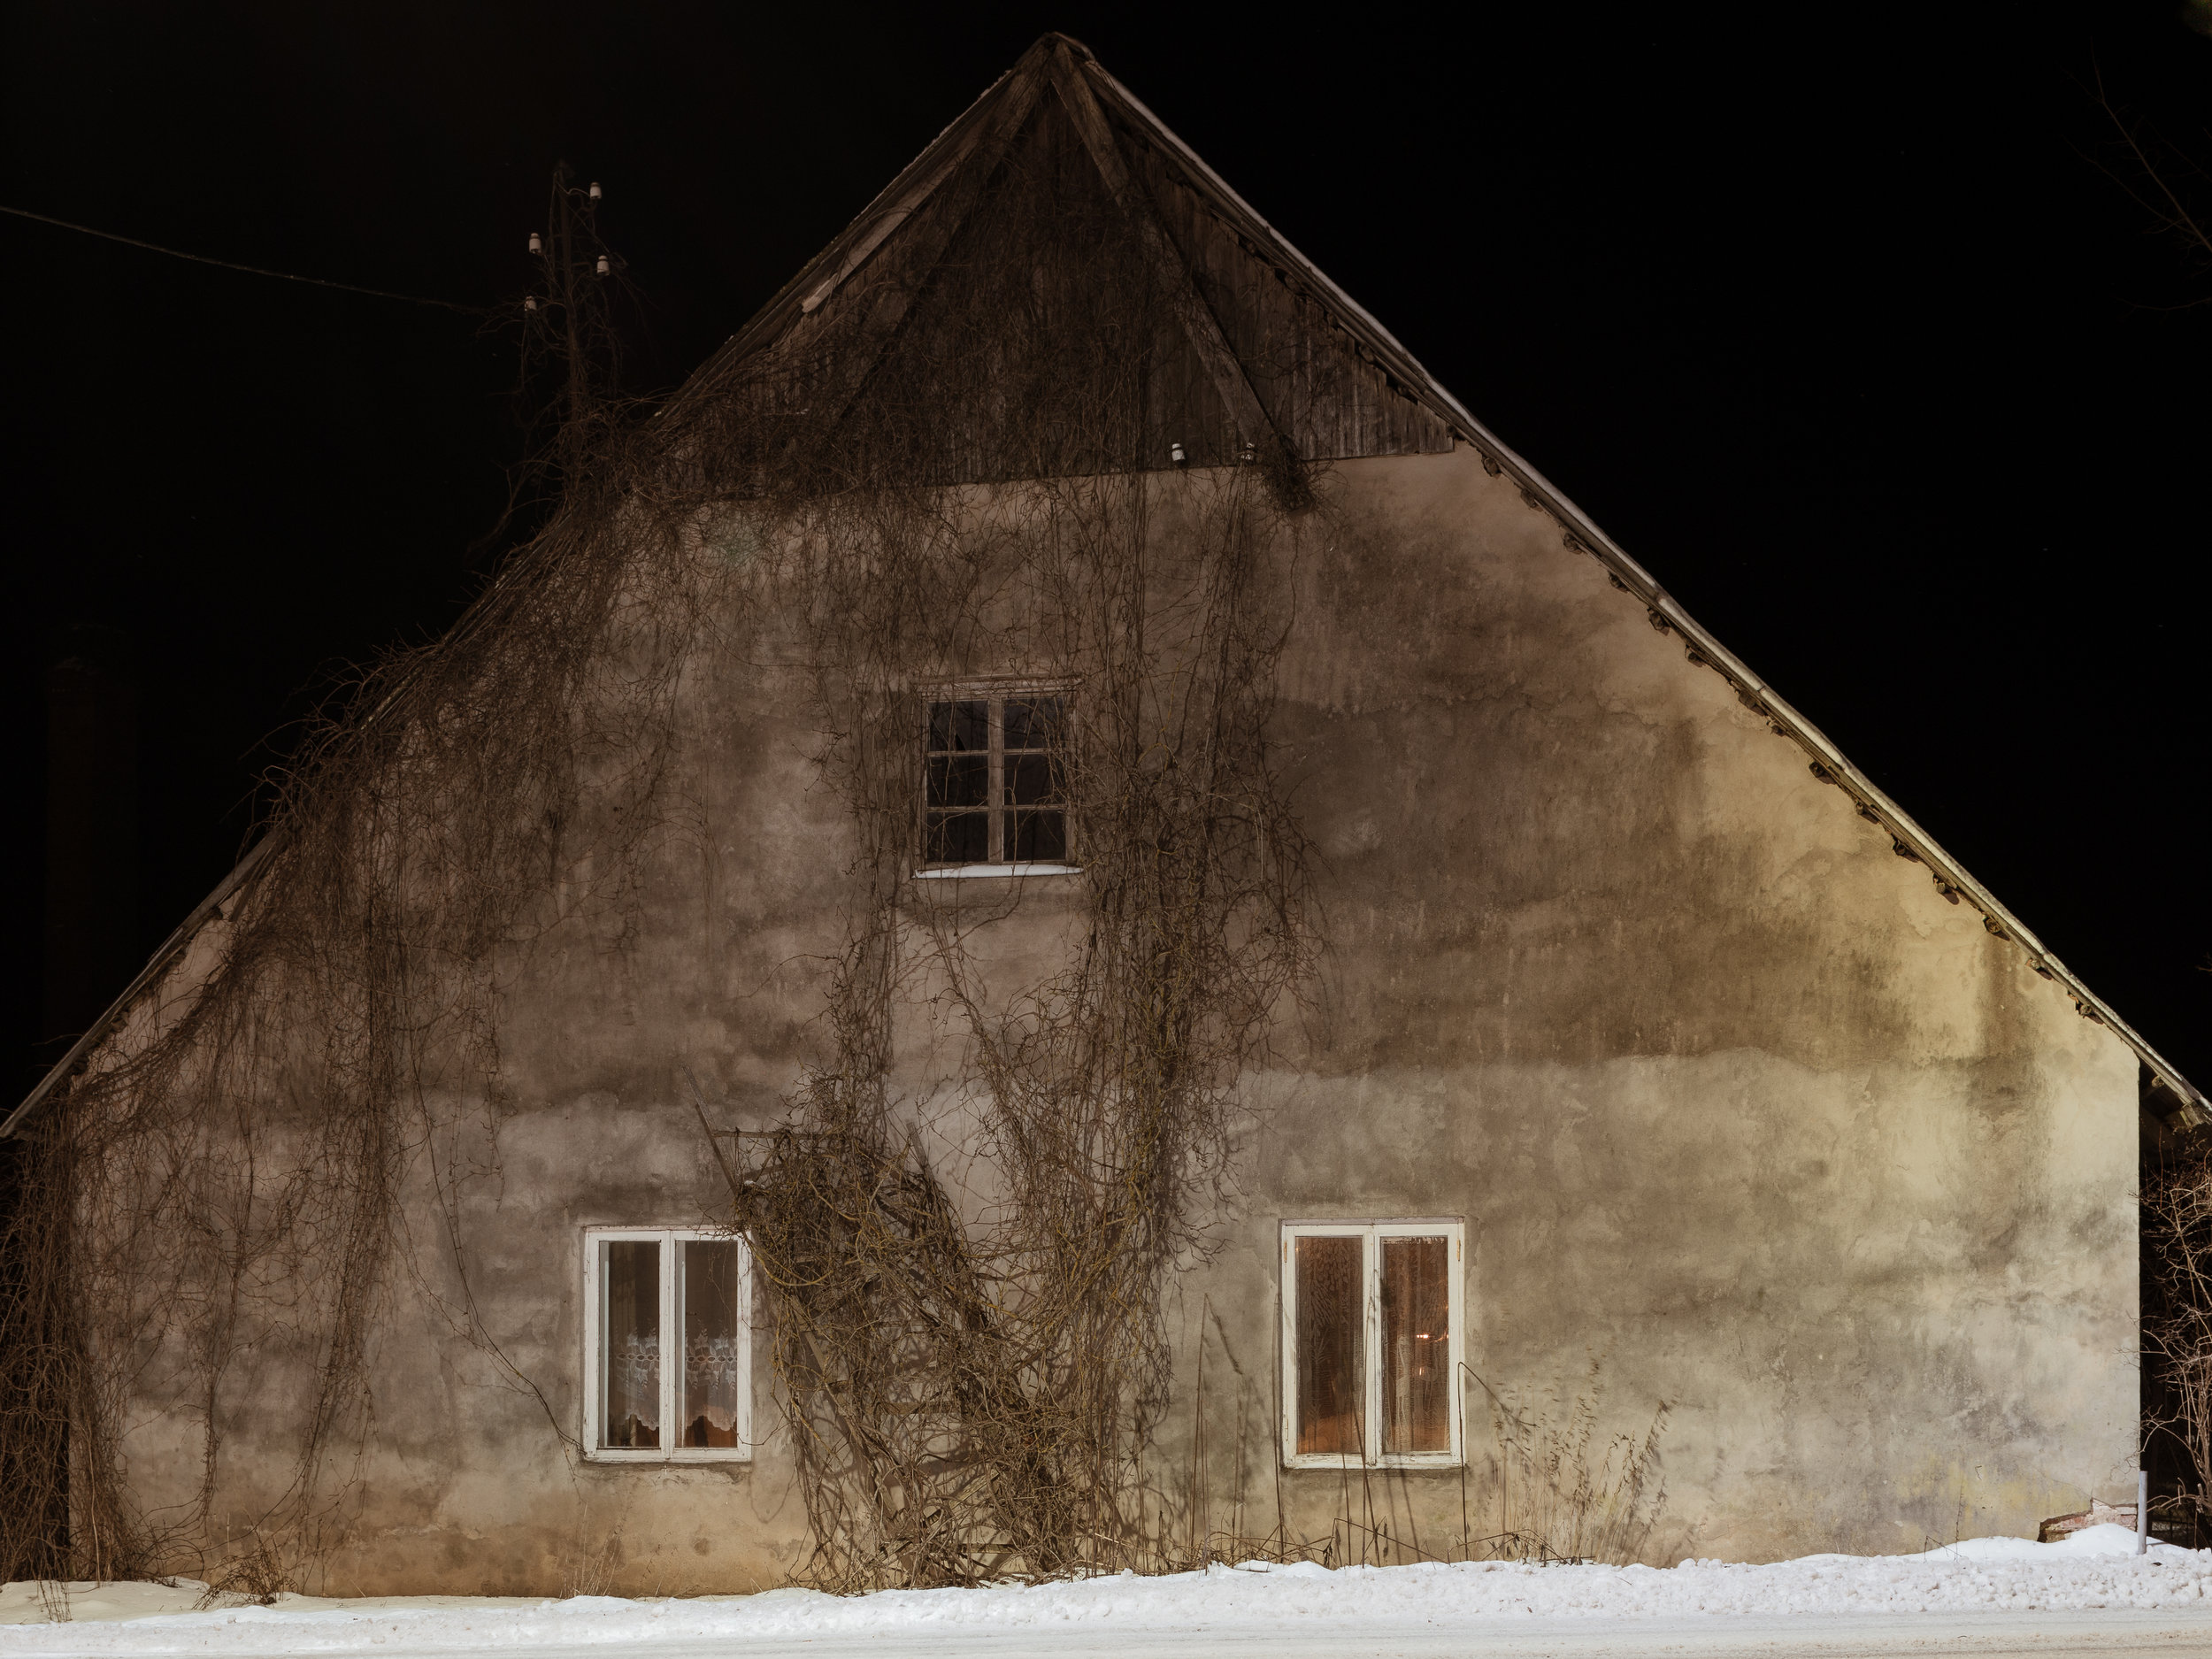 Viitina, Estonia, December 2017